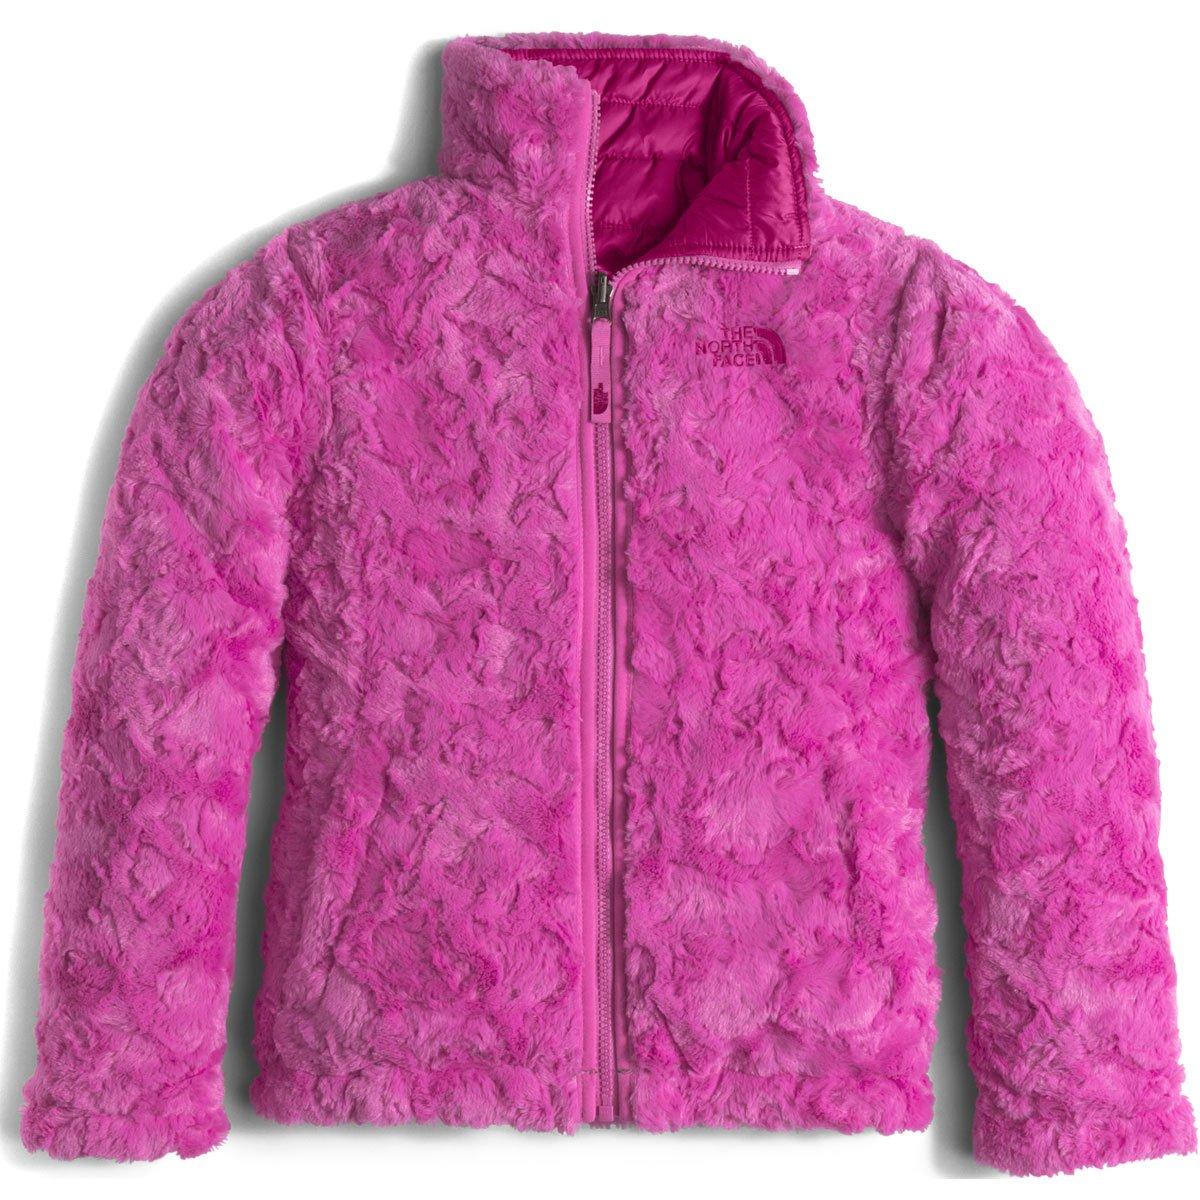 The North Face Reversible Mossbud Swirl Jacket Girls' Roxbury Pink Large